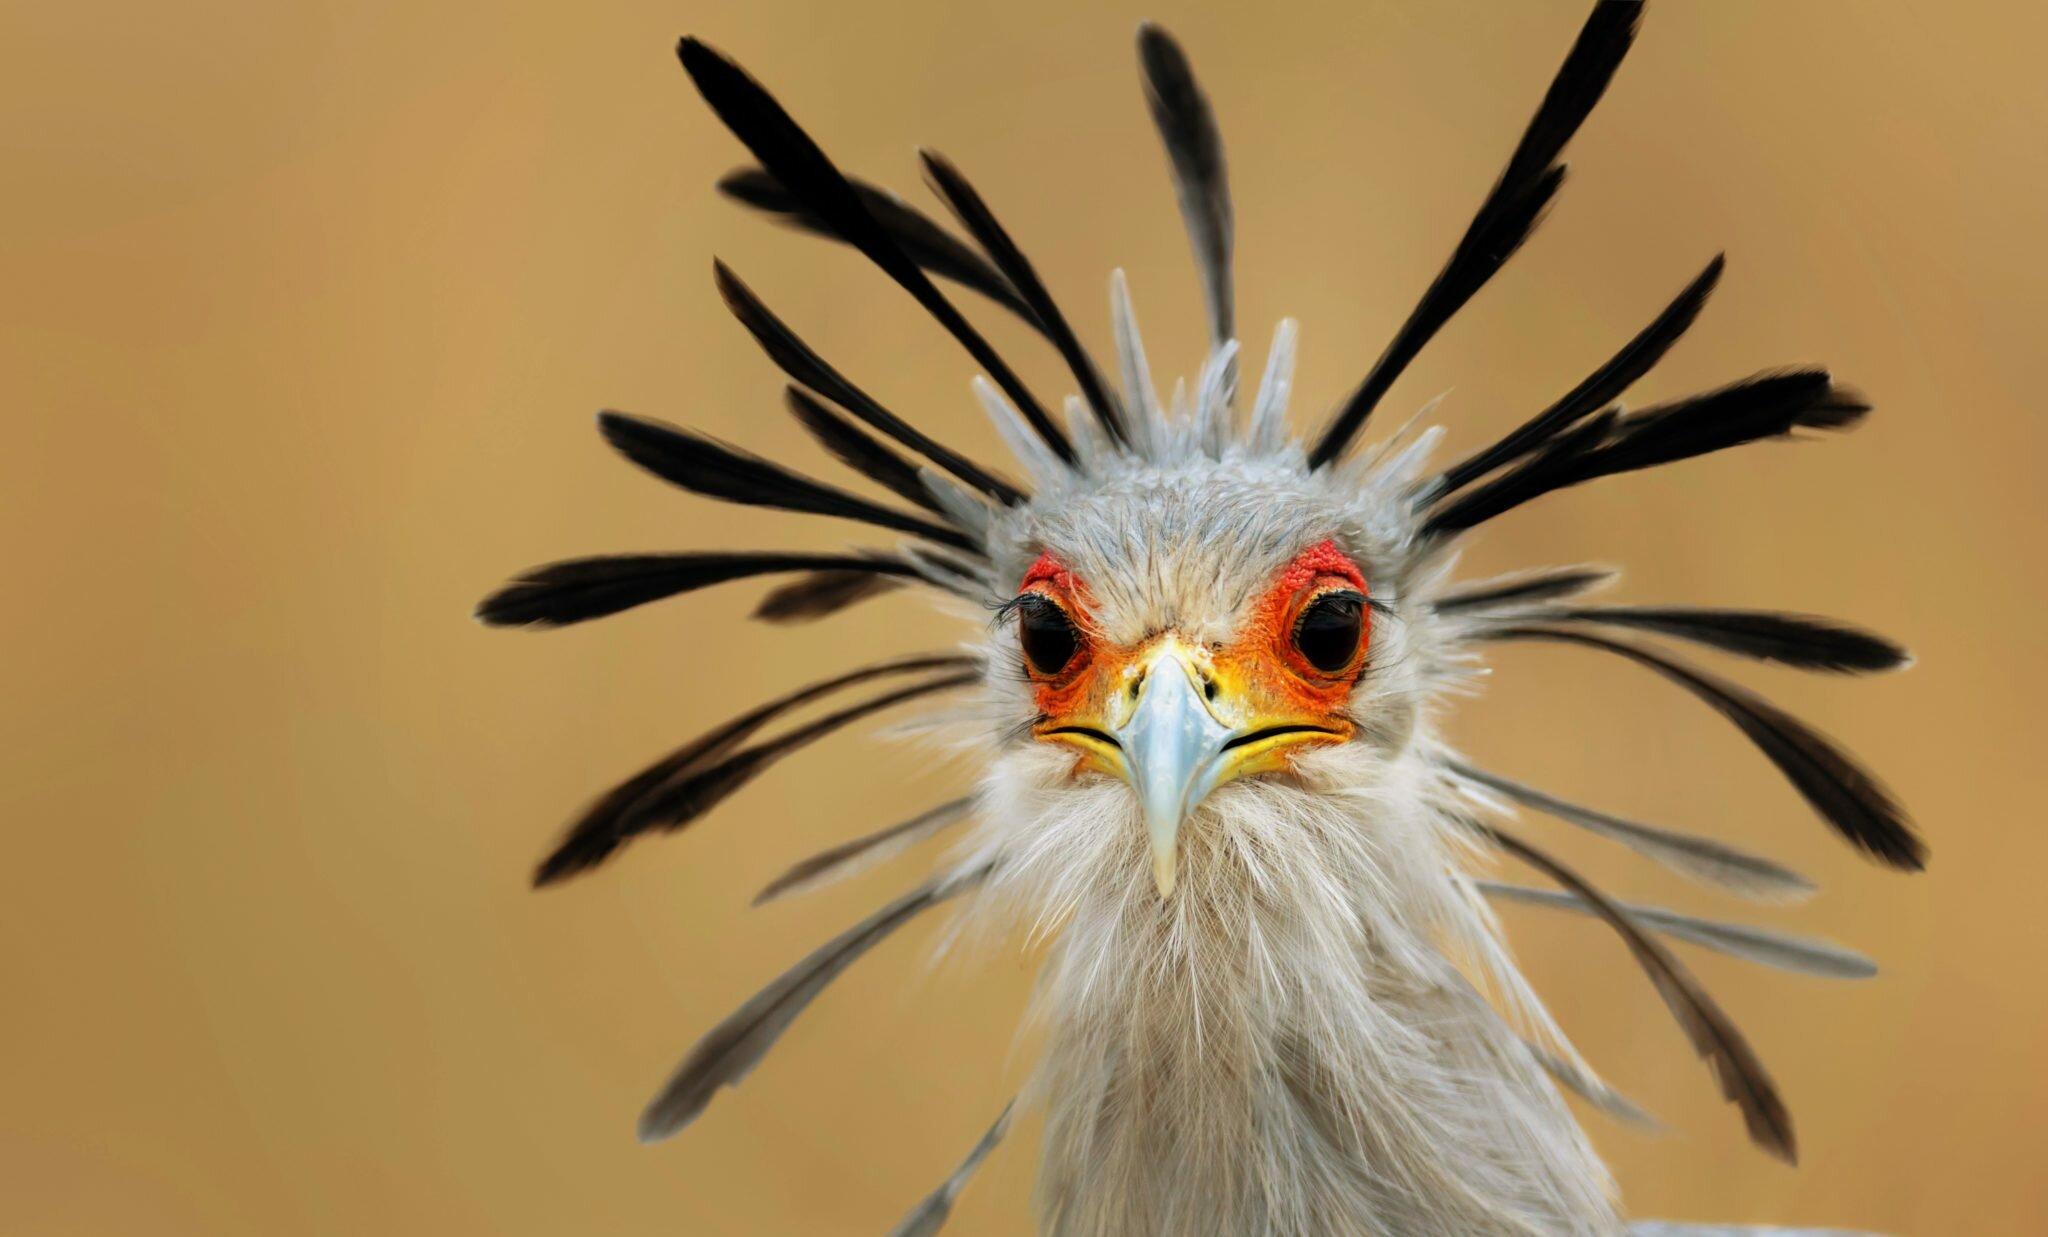 Secretary Bird with quills